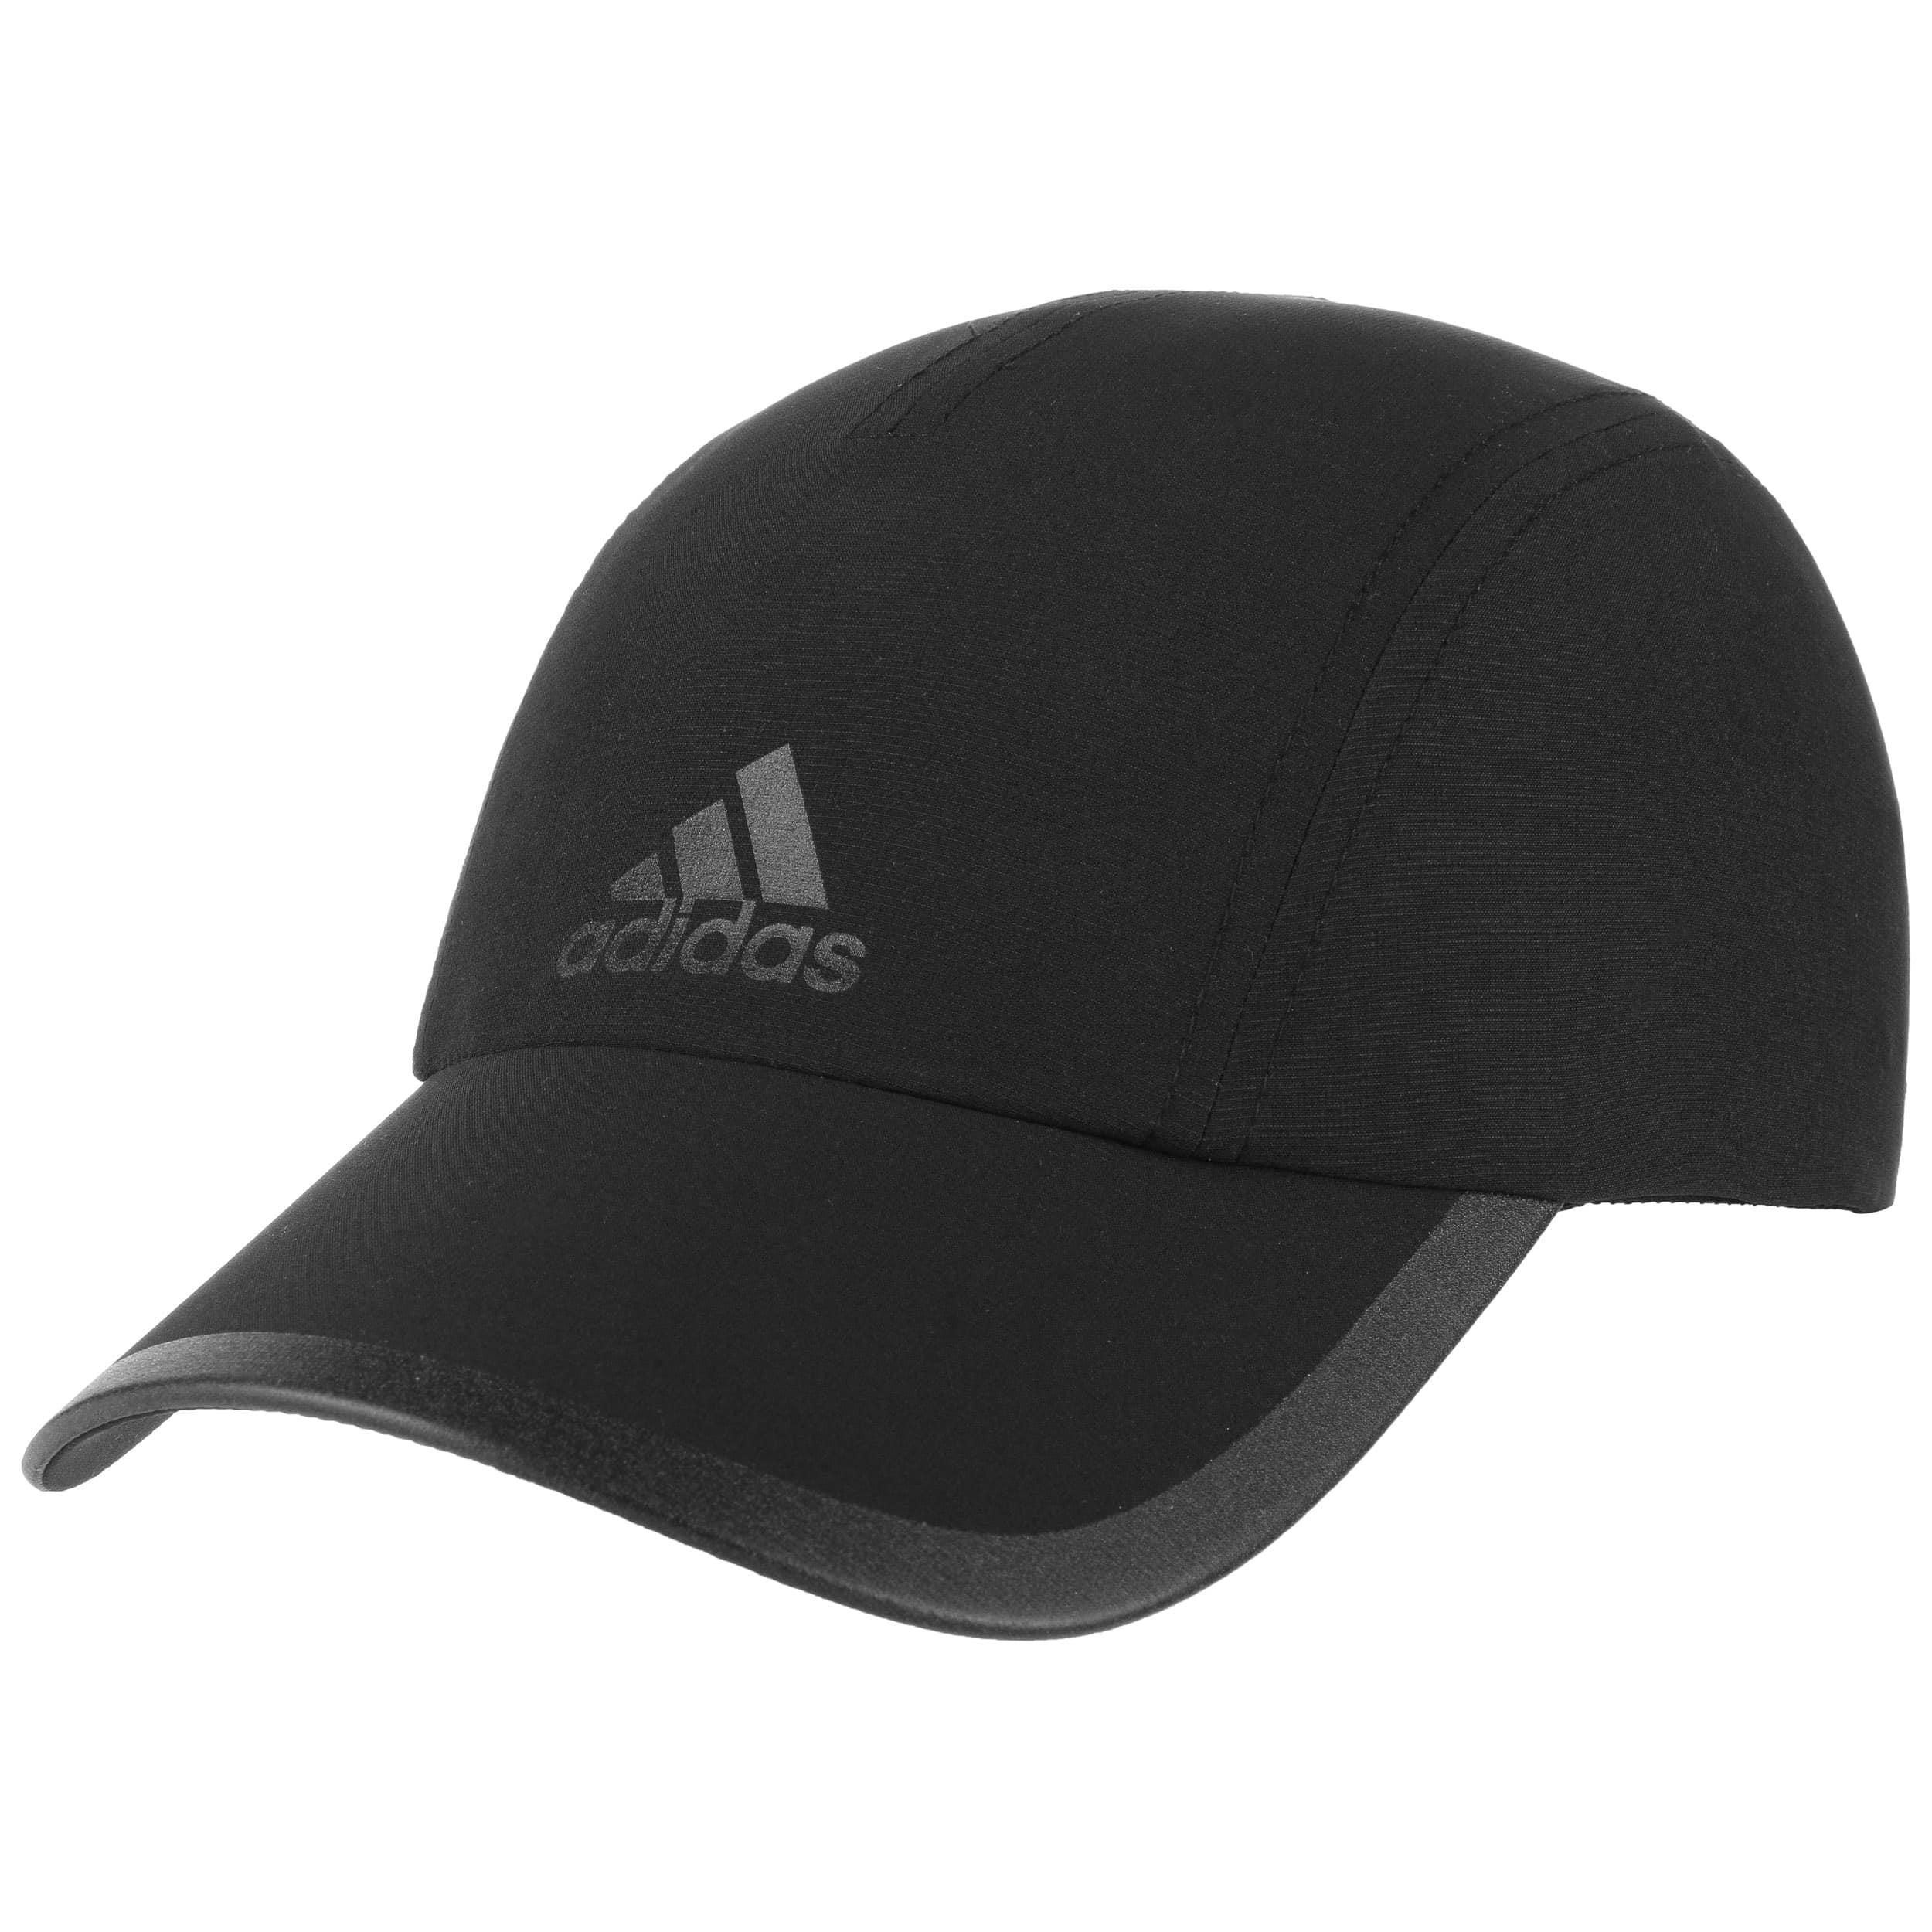 ... blue 5 · Climalite Running Cap by adidas - black 5 ... 492eb570d2d5